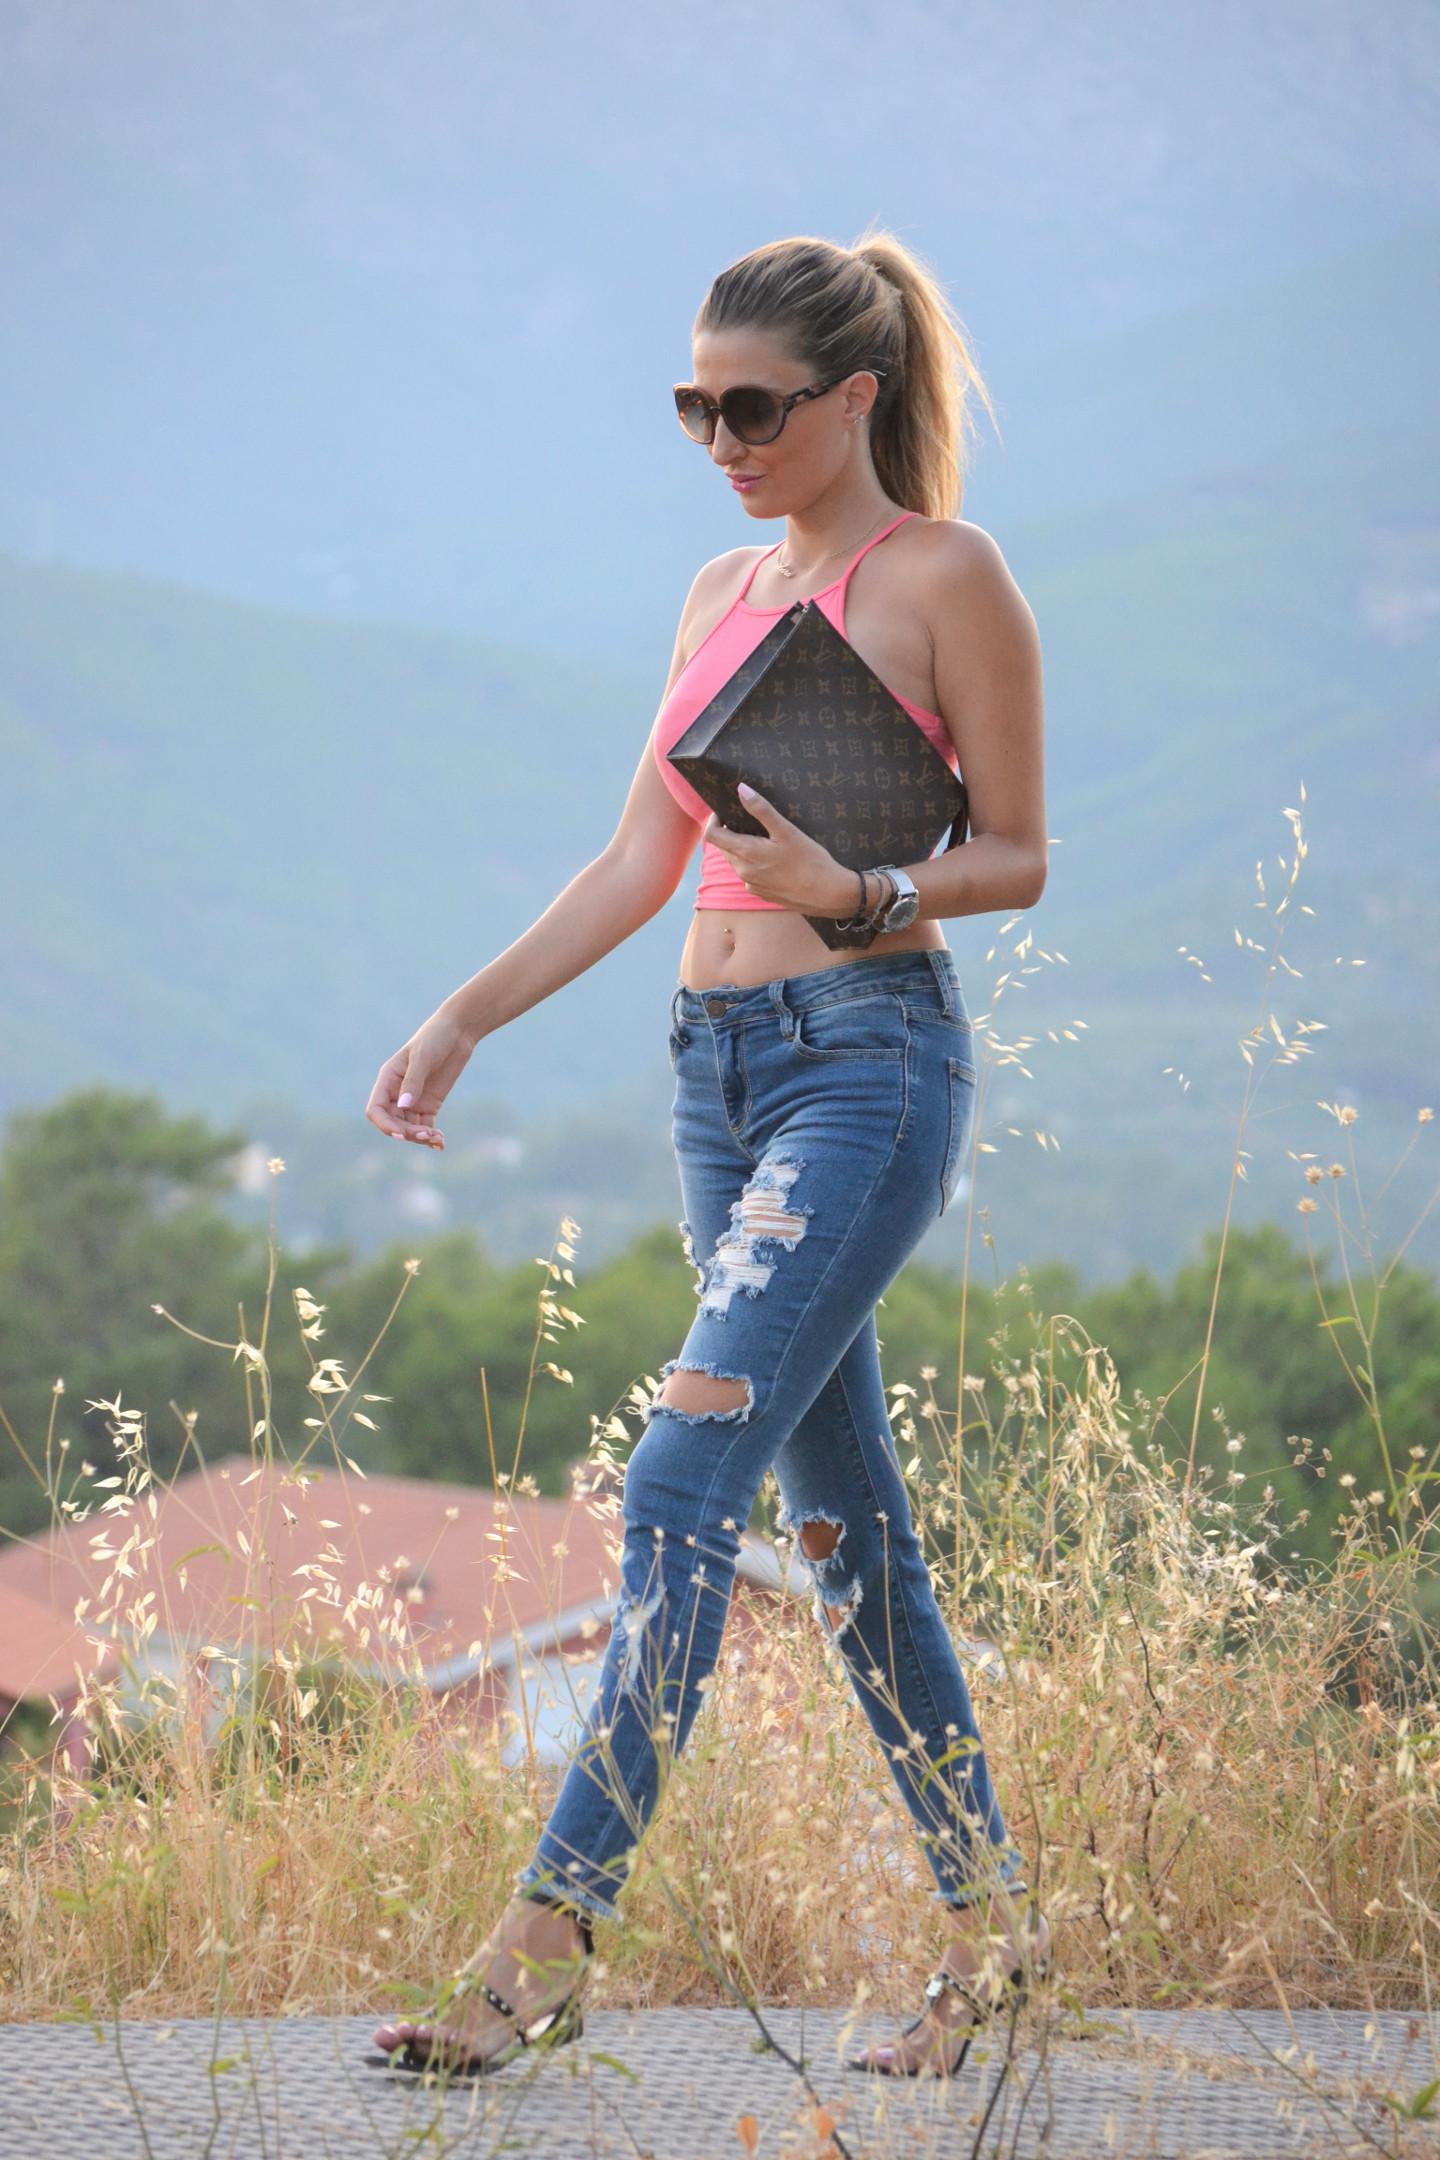 Sierra_Gredos_Mountain_MX5_Mazda_Lara_Martin_Gilarranz_Bymyheels (11)